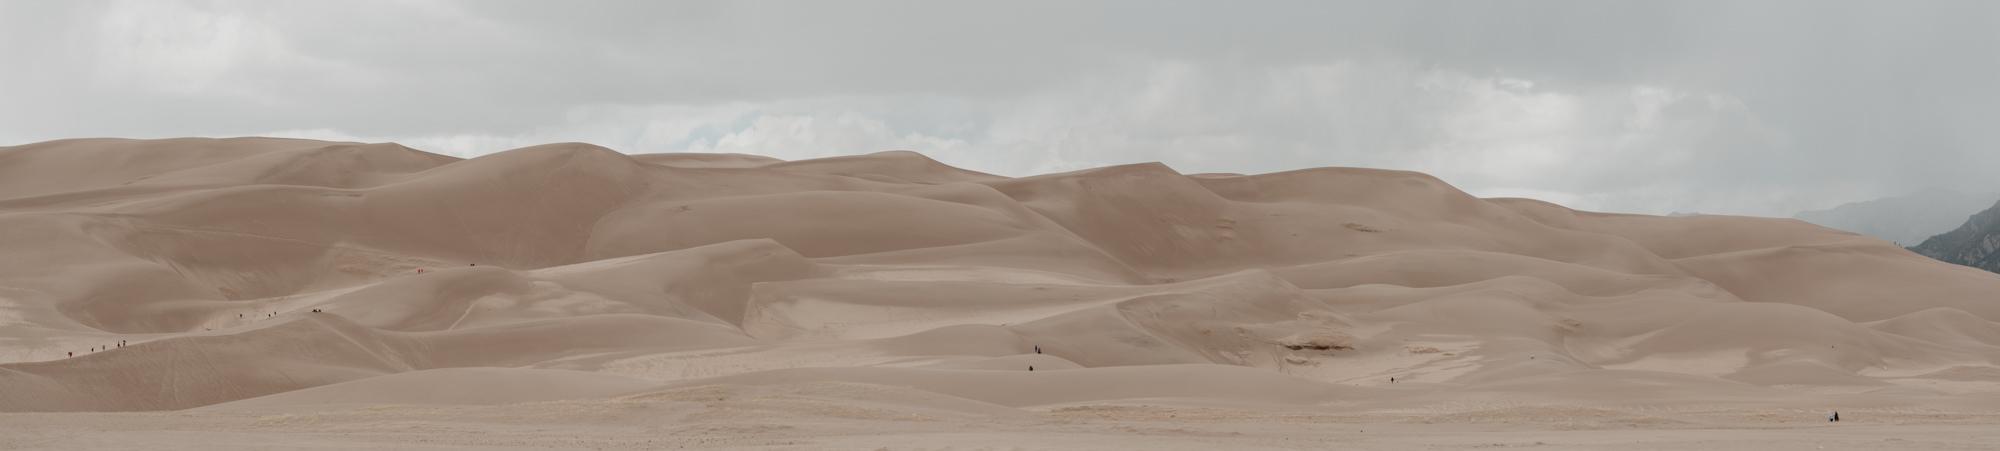 gread sand dunes national park panorama-1.jpg